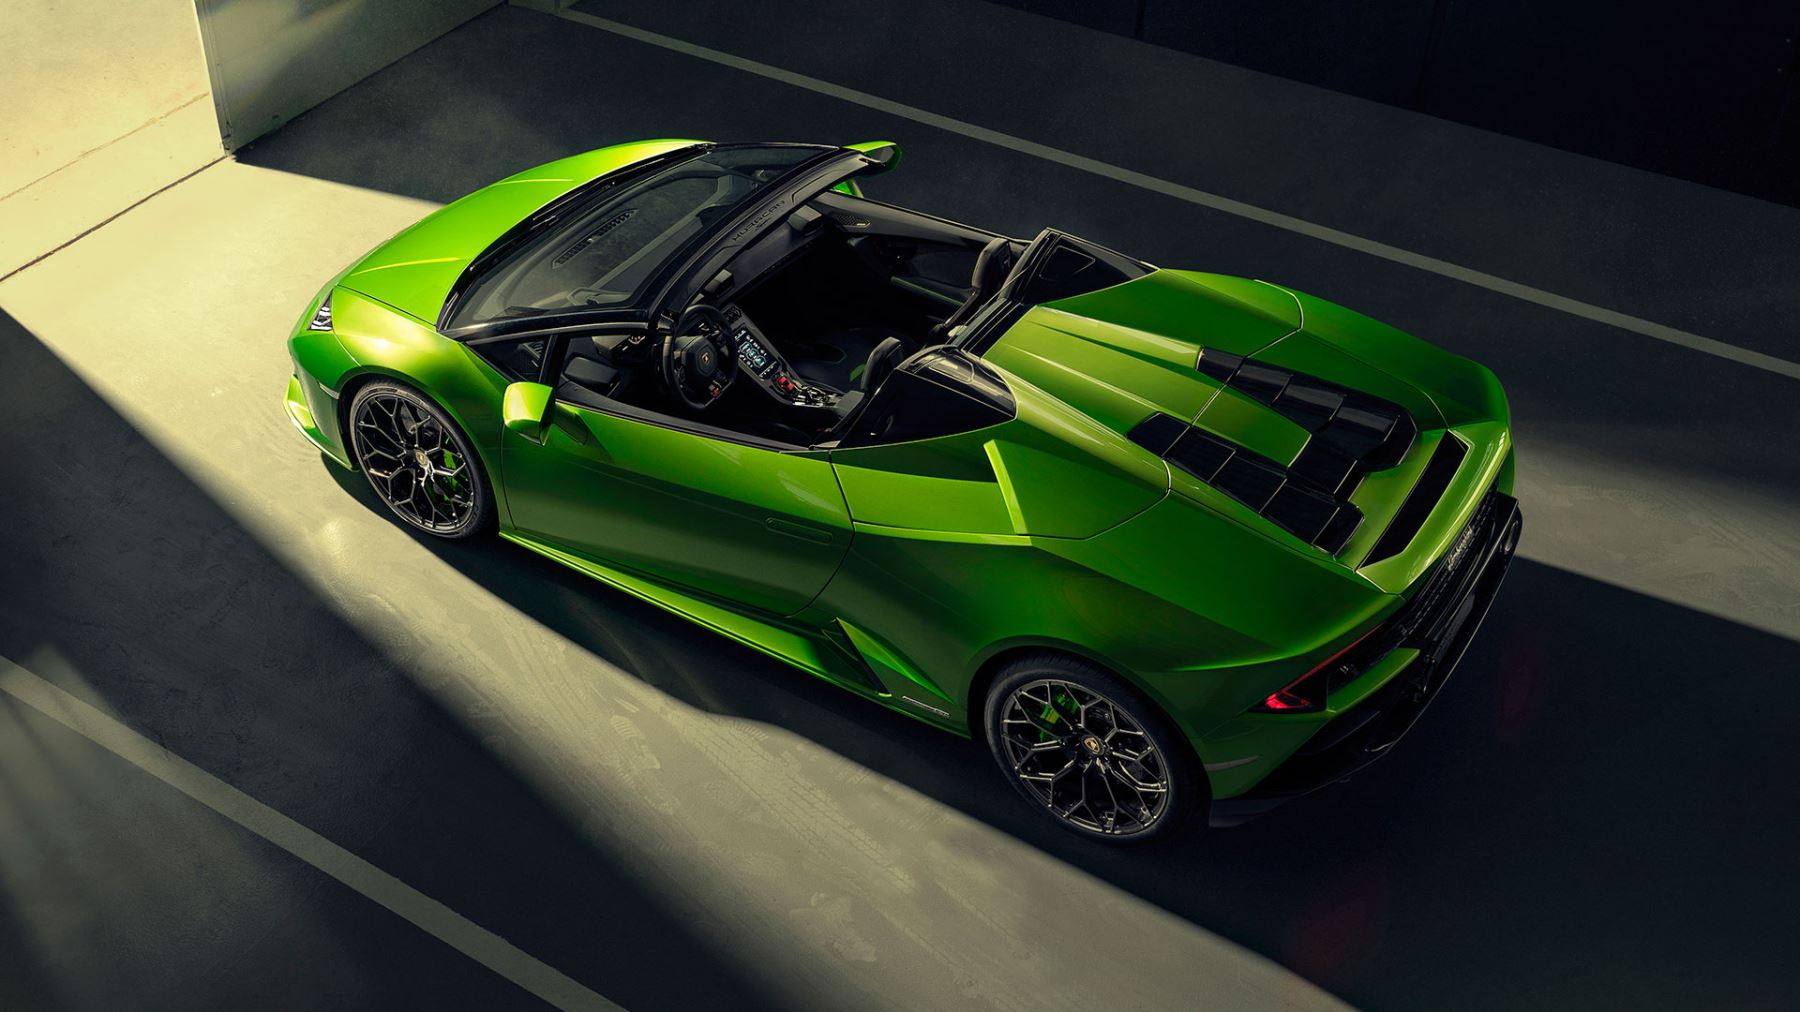 Lamborghini Huracan EVO Spyder - Every Day Amplified image 2